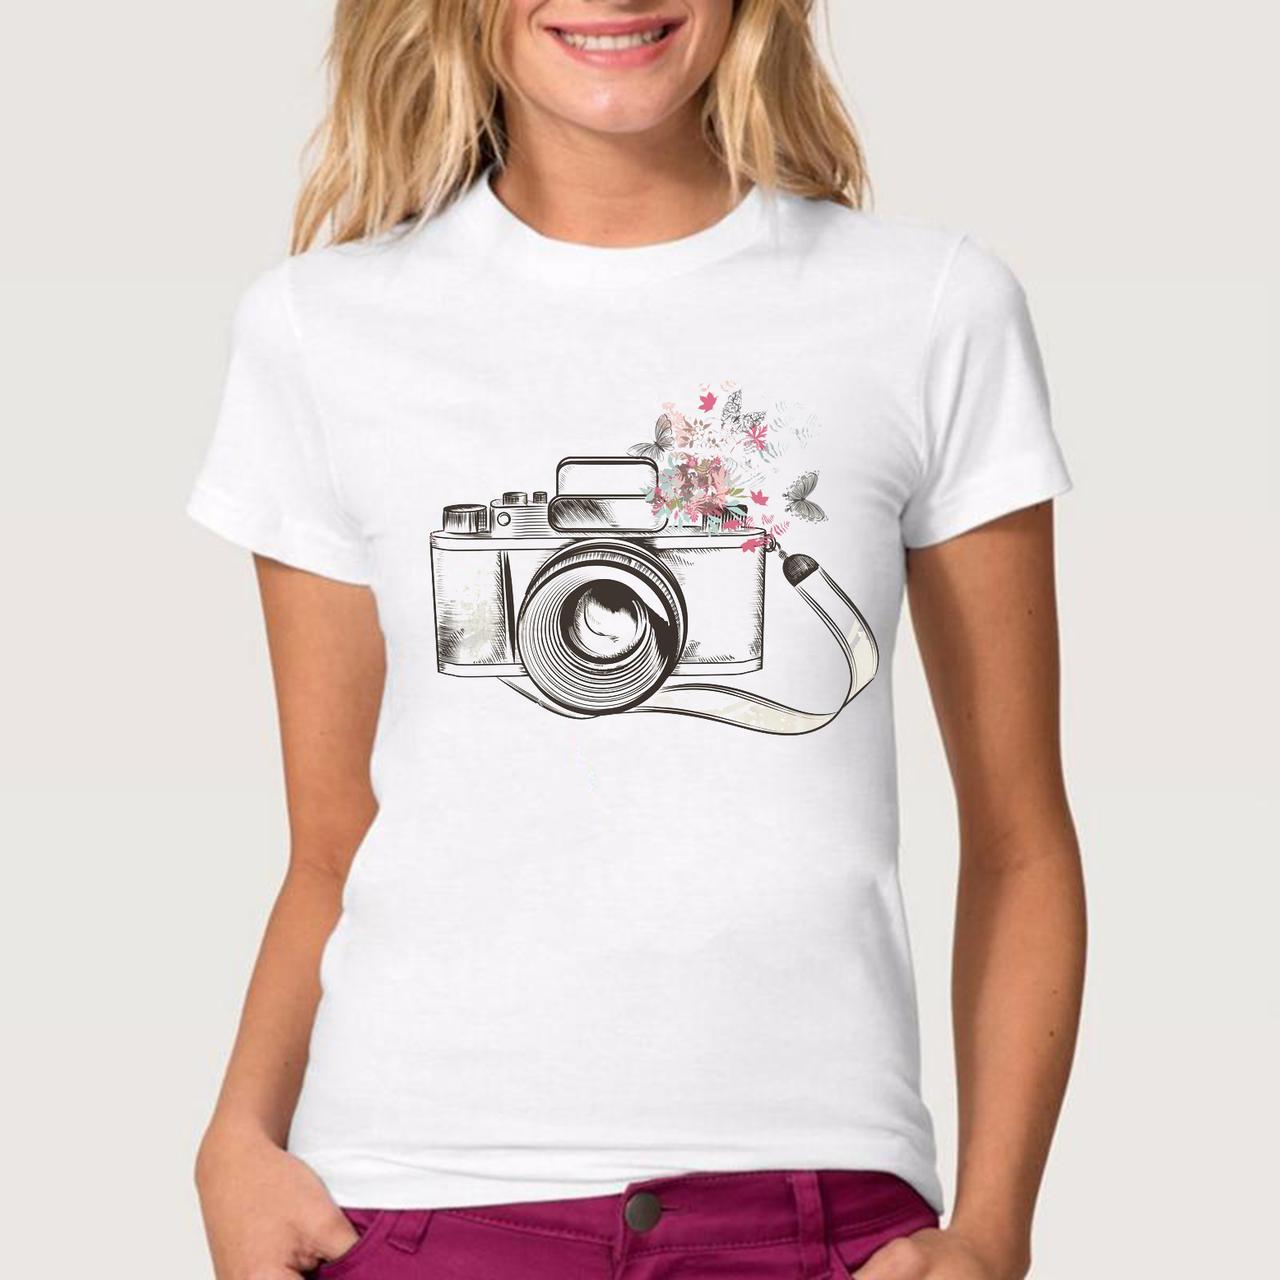 Футболка женская  фотоаппарат